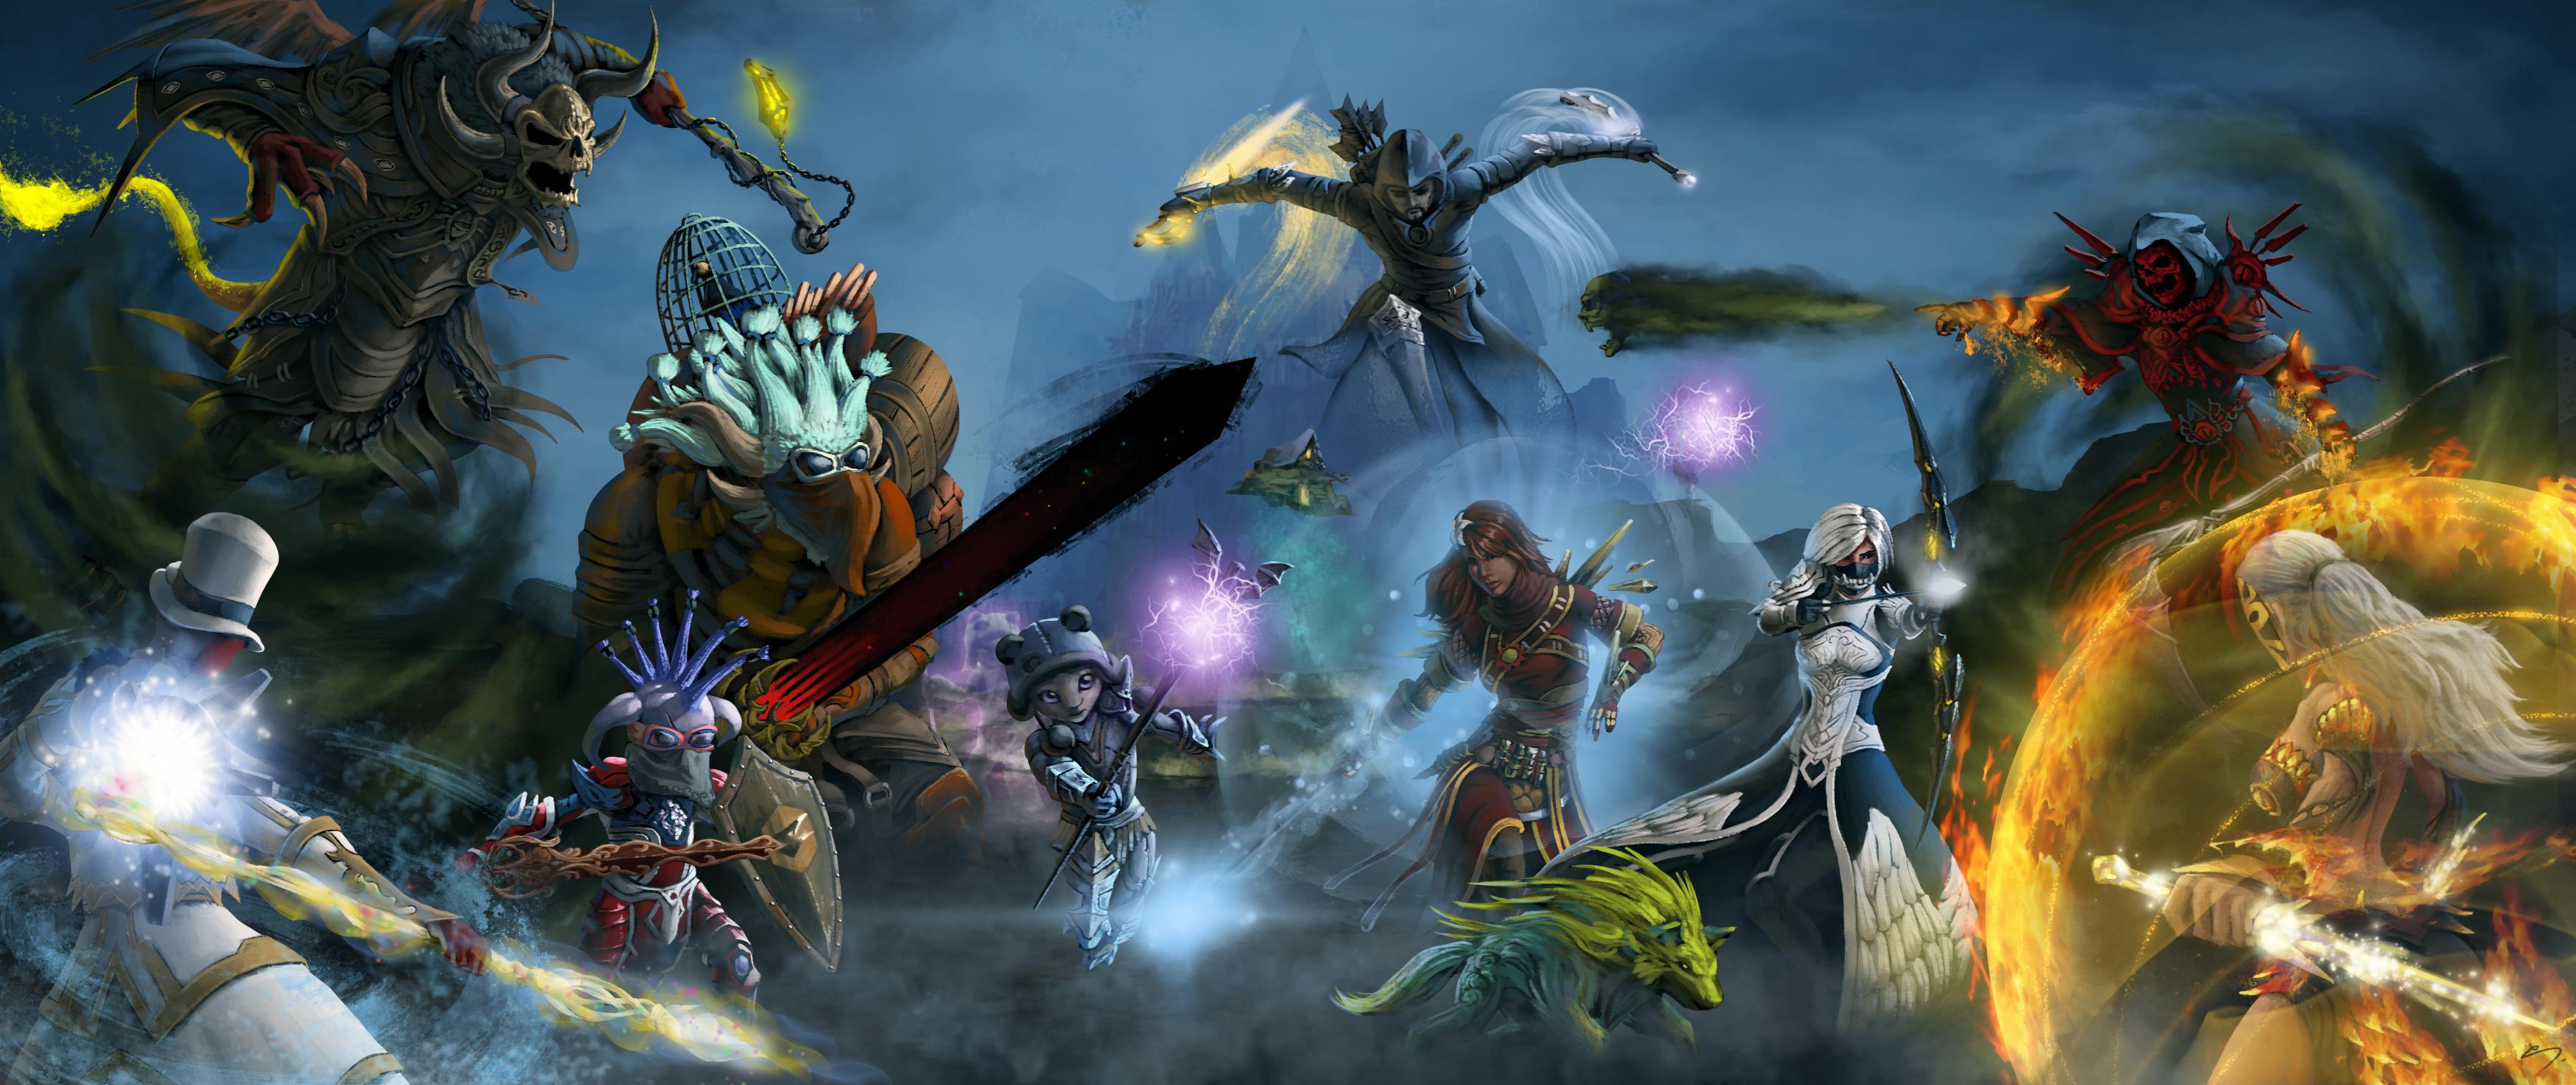 Guild Wars 2 Fond d'écran HD | Arrière-Plan | 3503x1475 | ID:610735 - Wallpaper Abyss